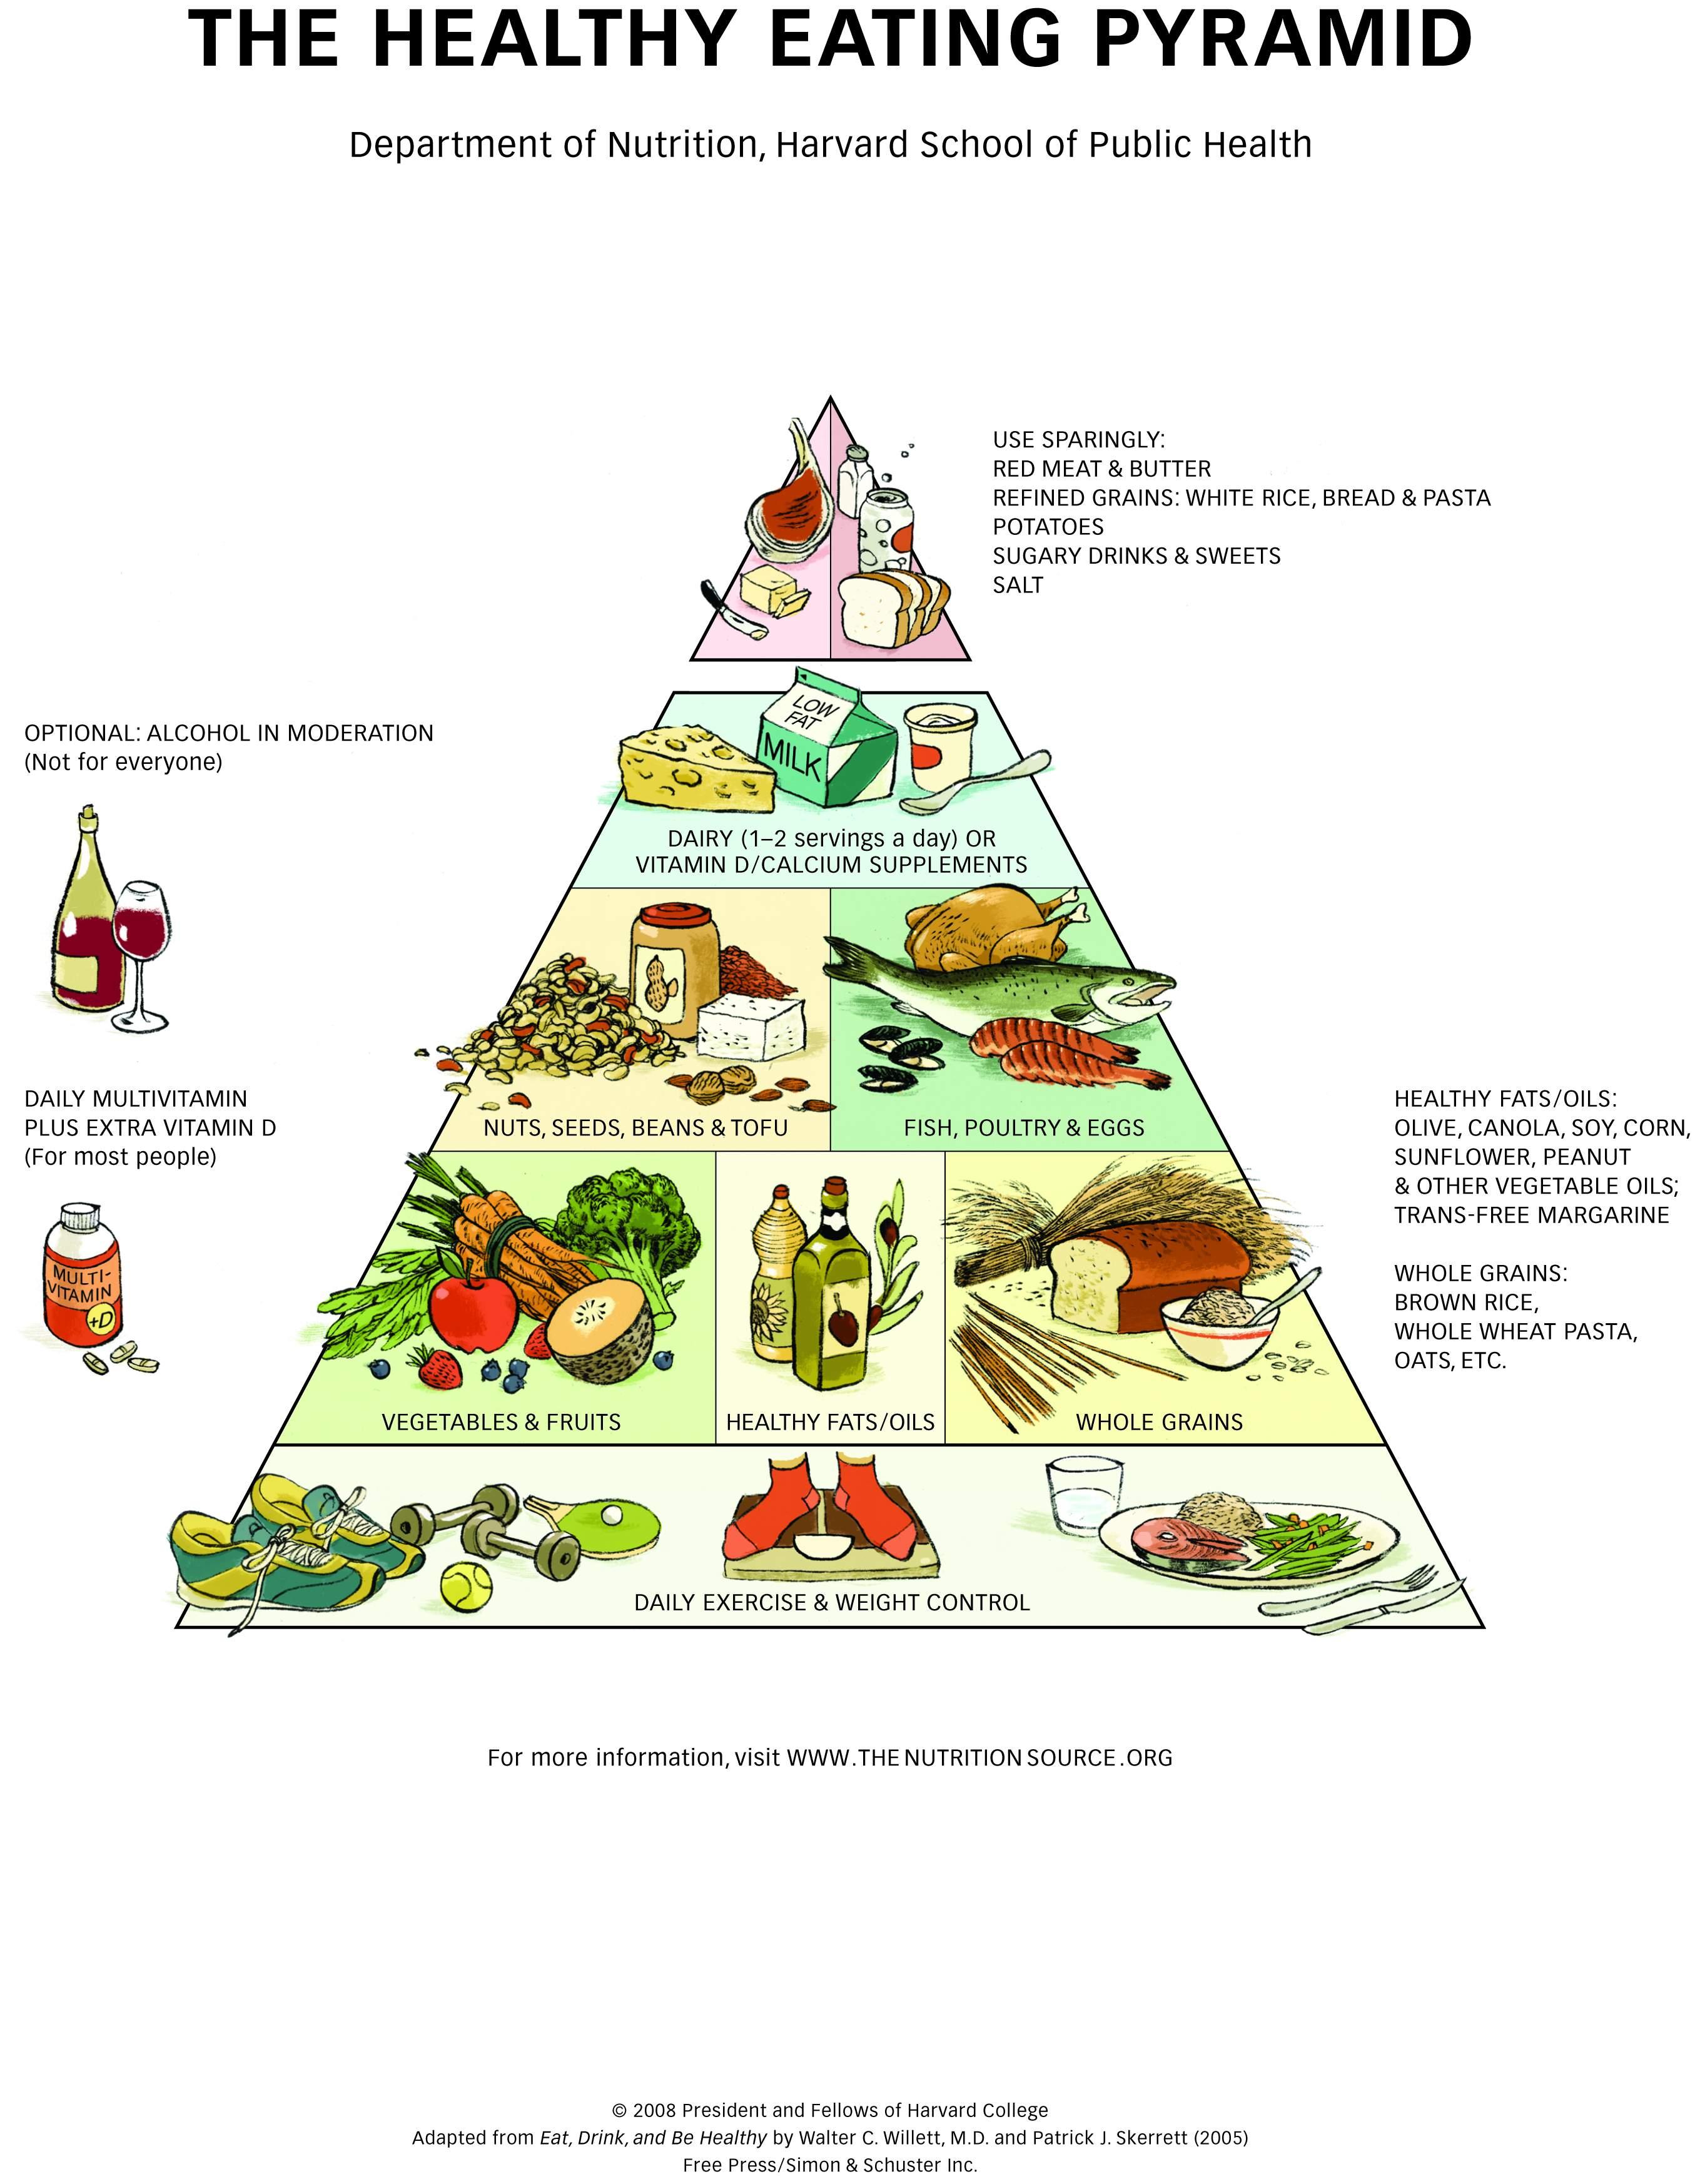 http://www.mediterraneandiet.com/Images/HealthyEatingPyramid-HighRes.jpg